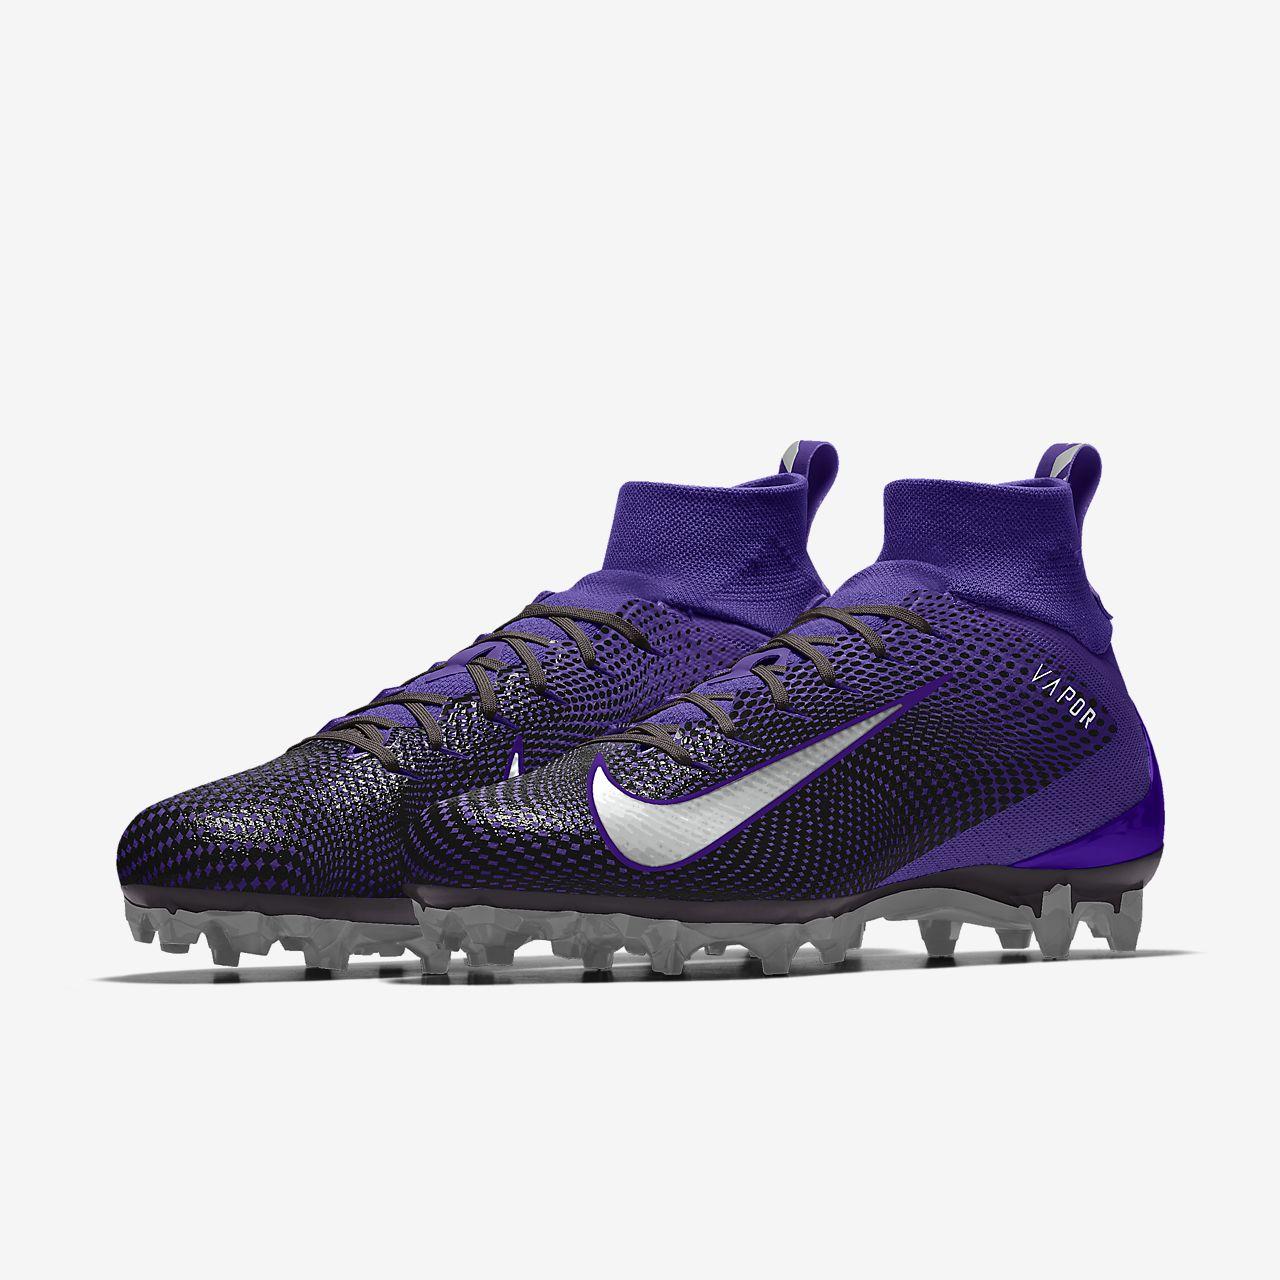 Nike Vapor Untouchable Pro 3 By You personalisierbarer Herren Fußballschuh